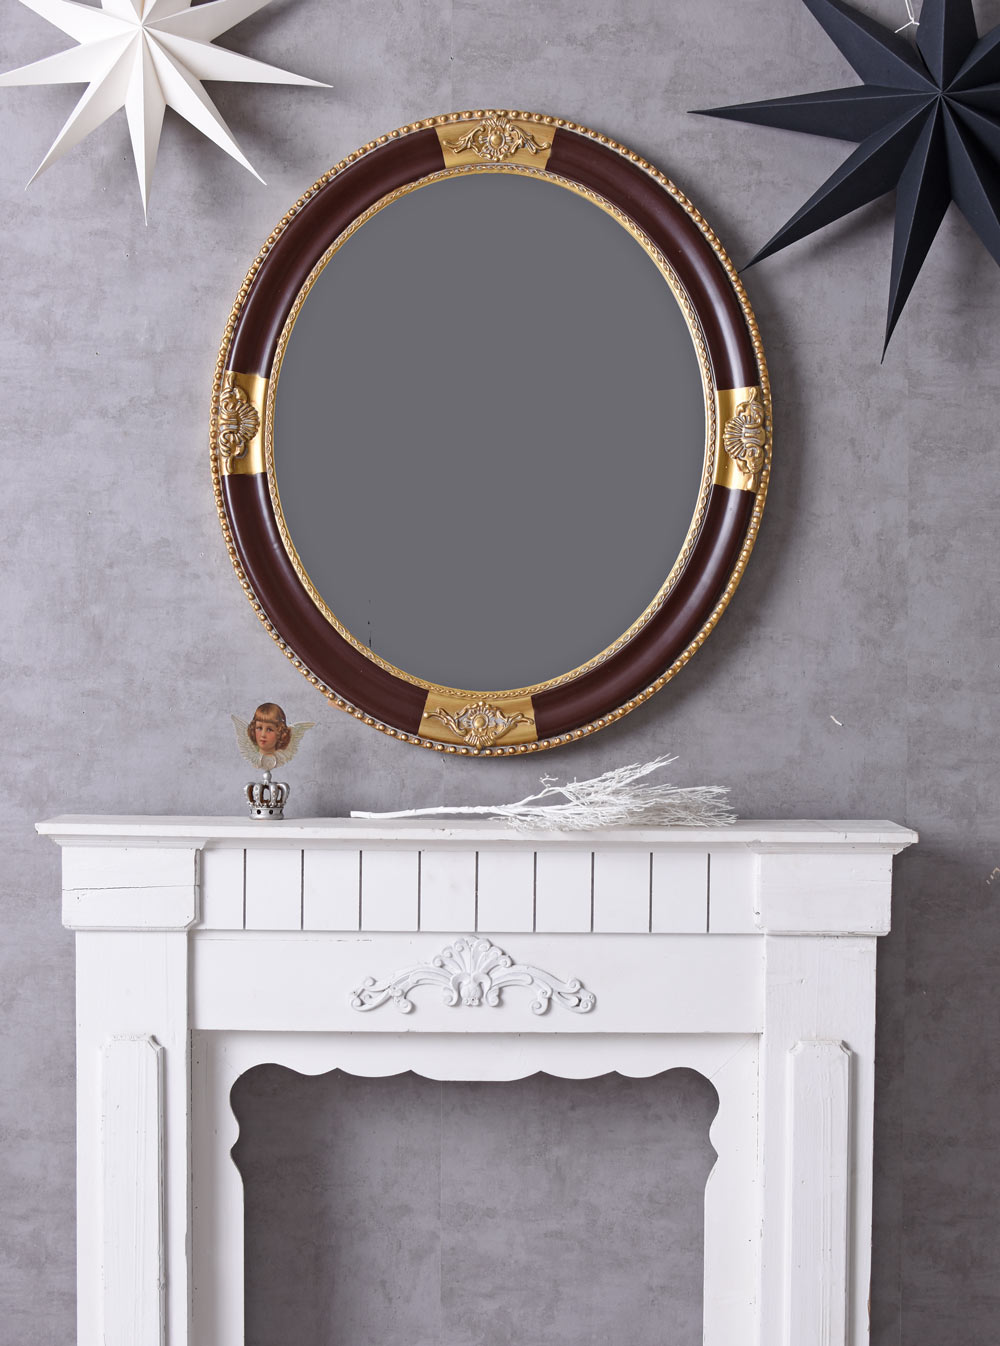 spiegel rund wandspiegel barock dekospiegel kaminspiegel flurspiegel antik gold ebay. Black Bedroom Furniture Sets. Home Design Ideas